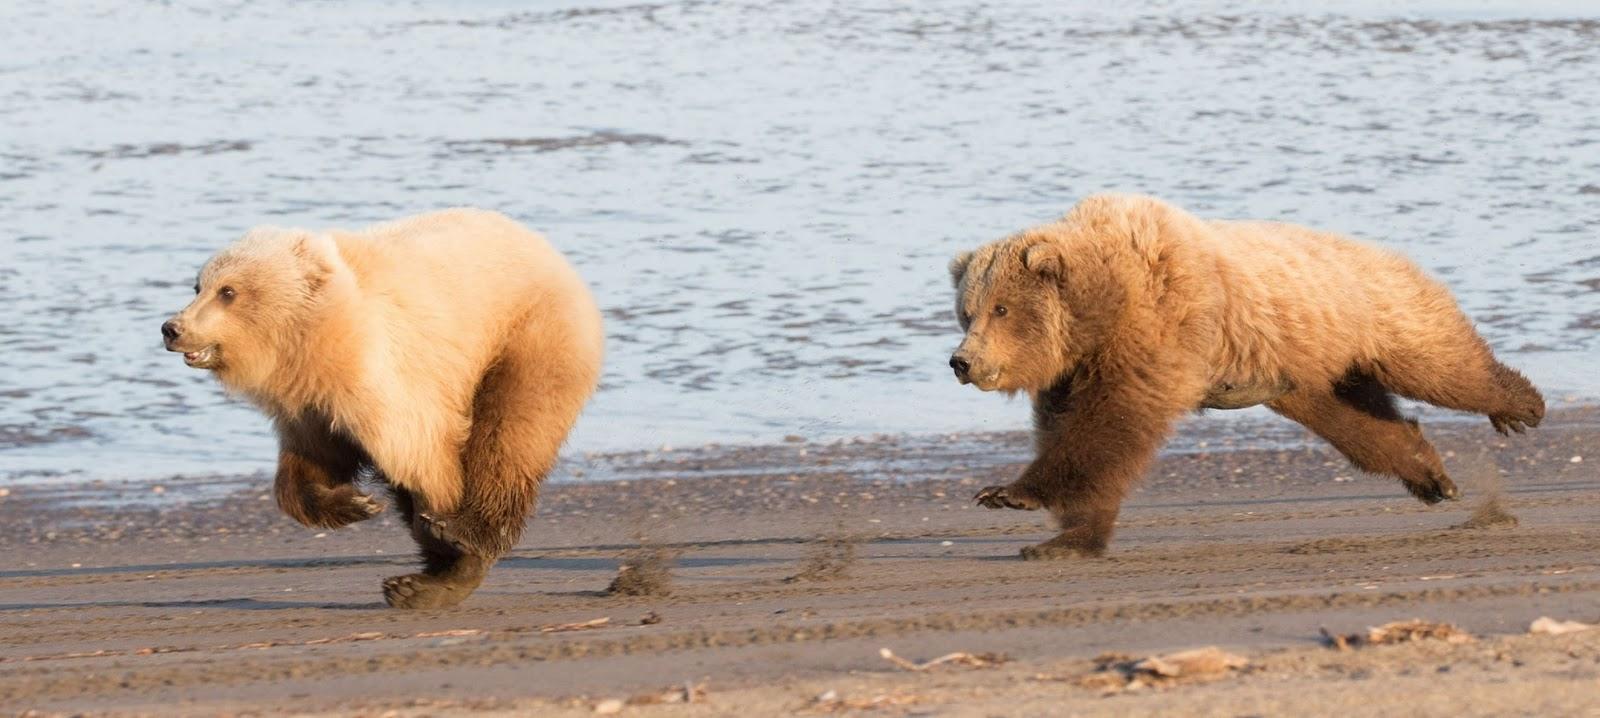 Adorables imgenes de osos disfrutando libres de un da de